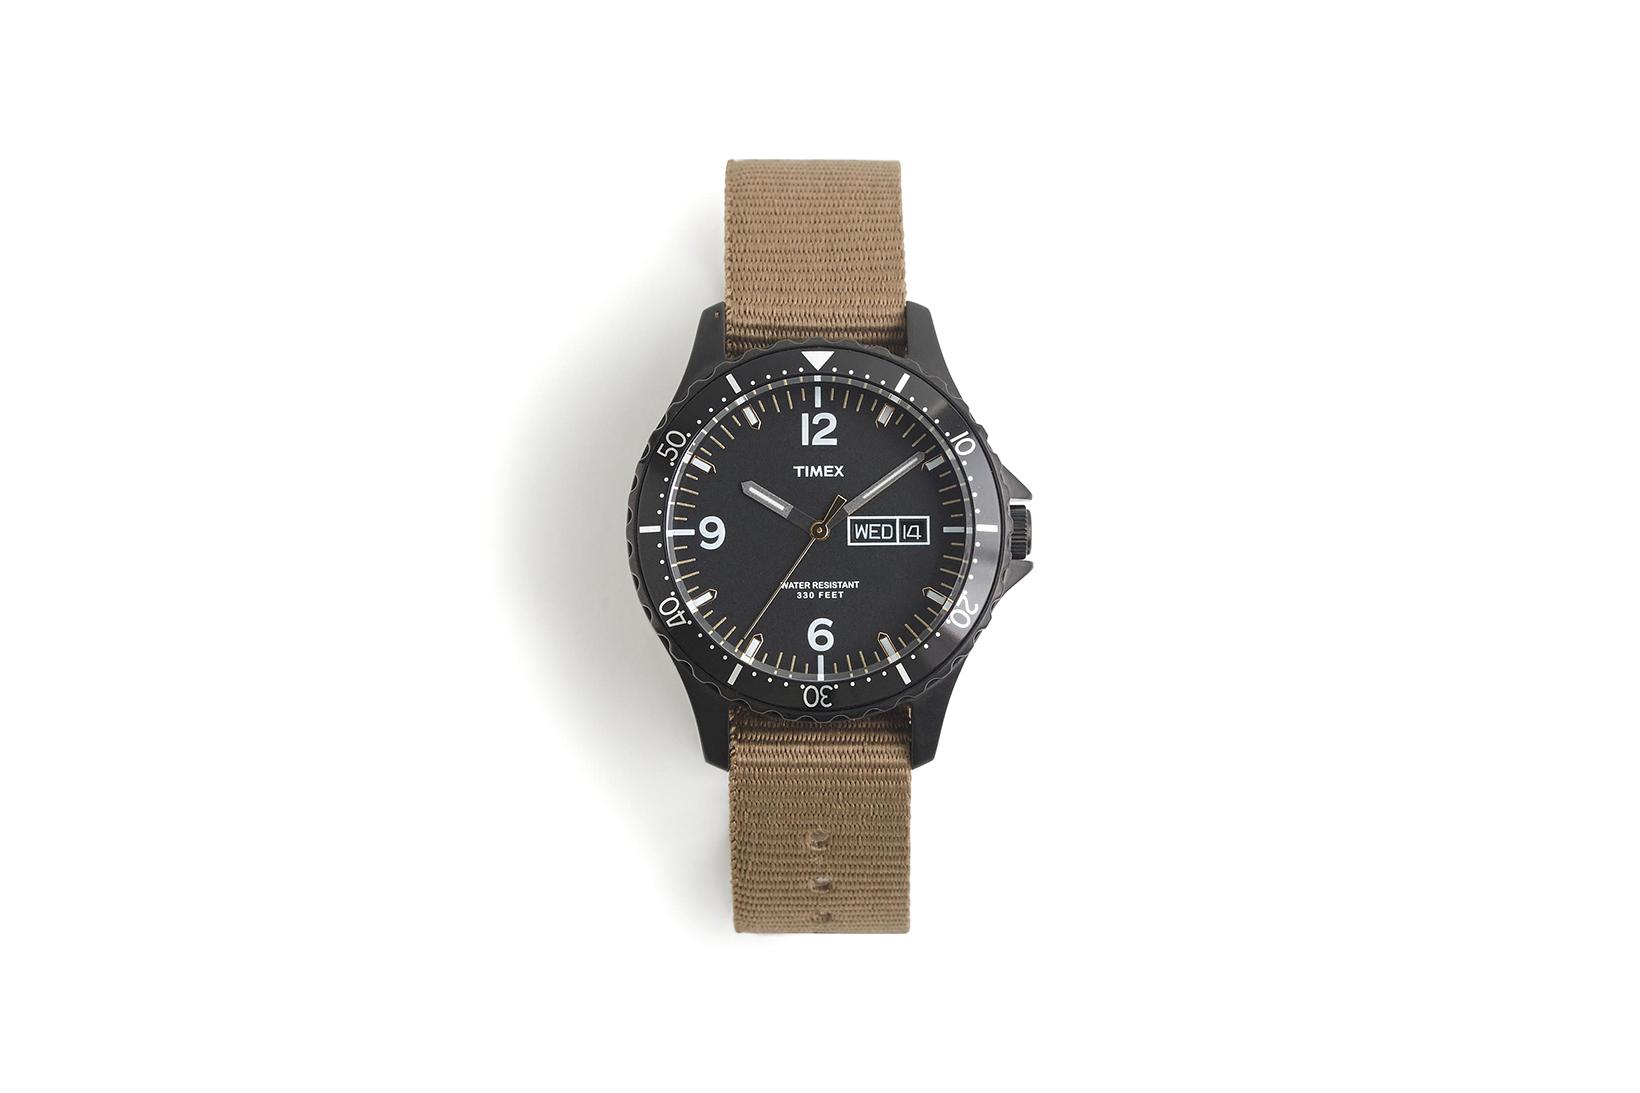 J.Crew & Timex Introduce a Black & Brown Diver